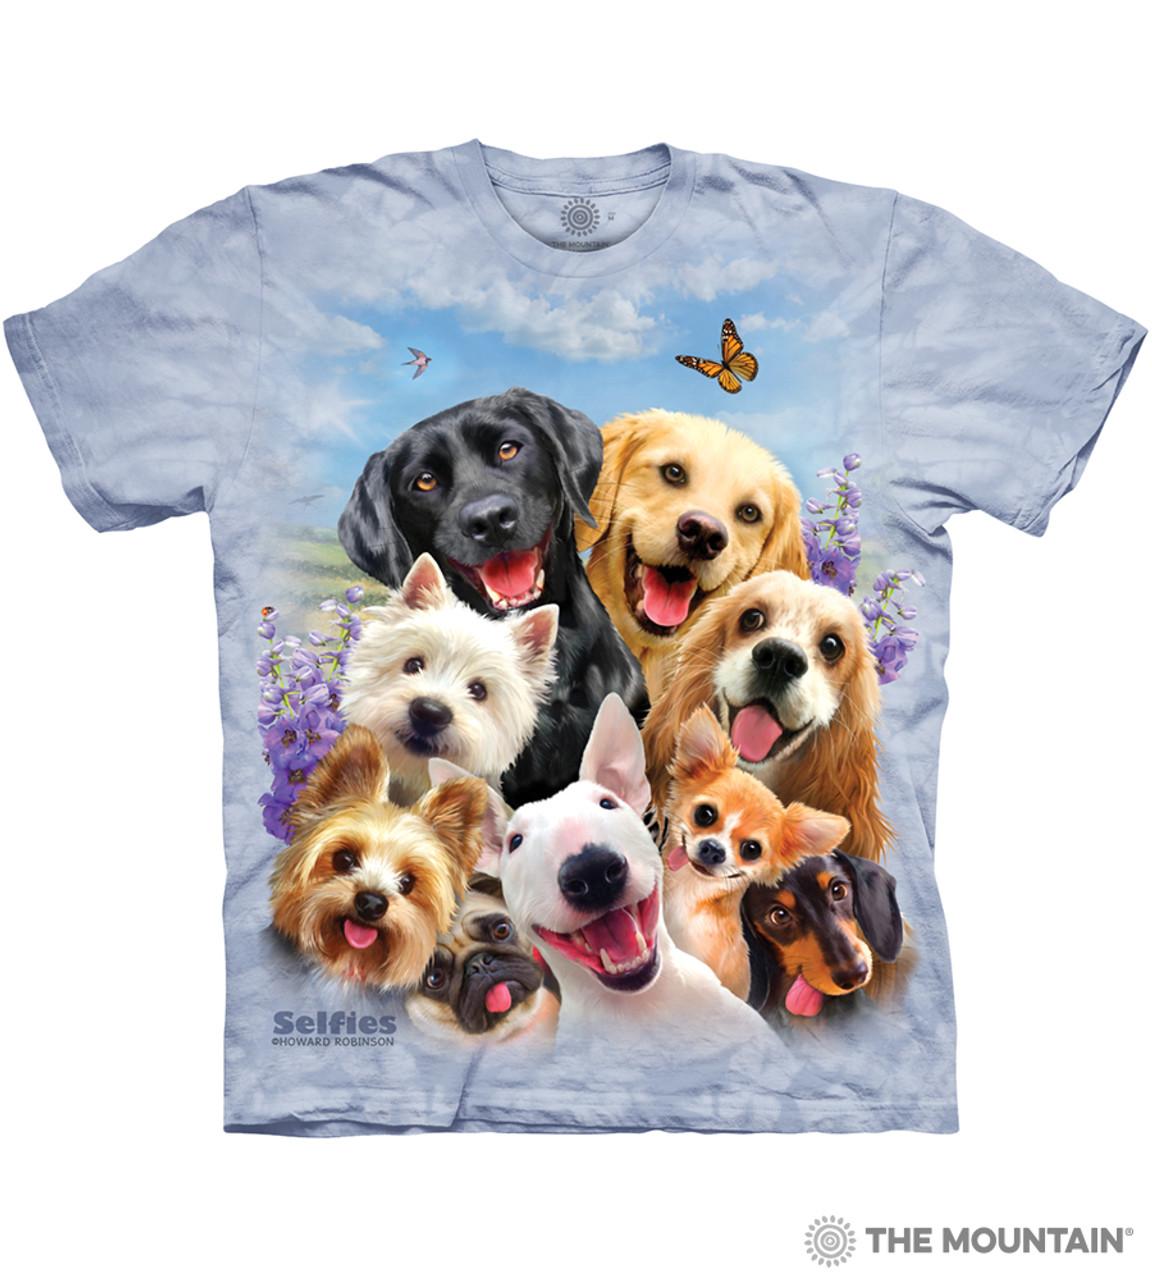 1d7c44e44a5b Dogs Selfie - The Mountain Adult Unisex T-Shirt